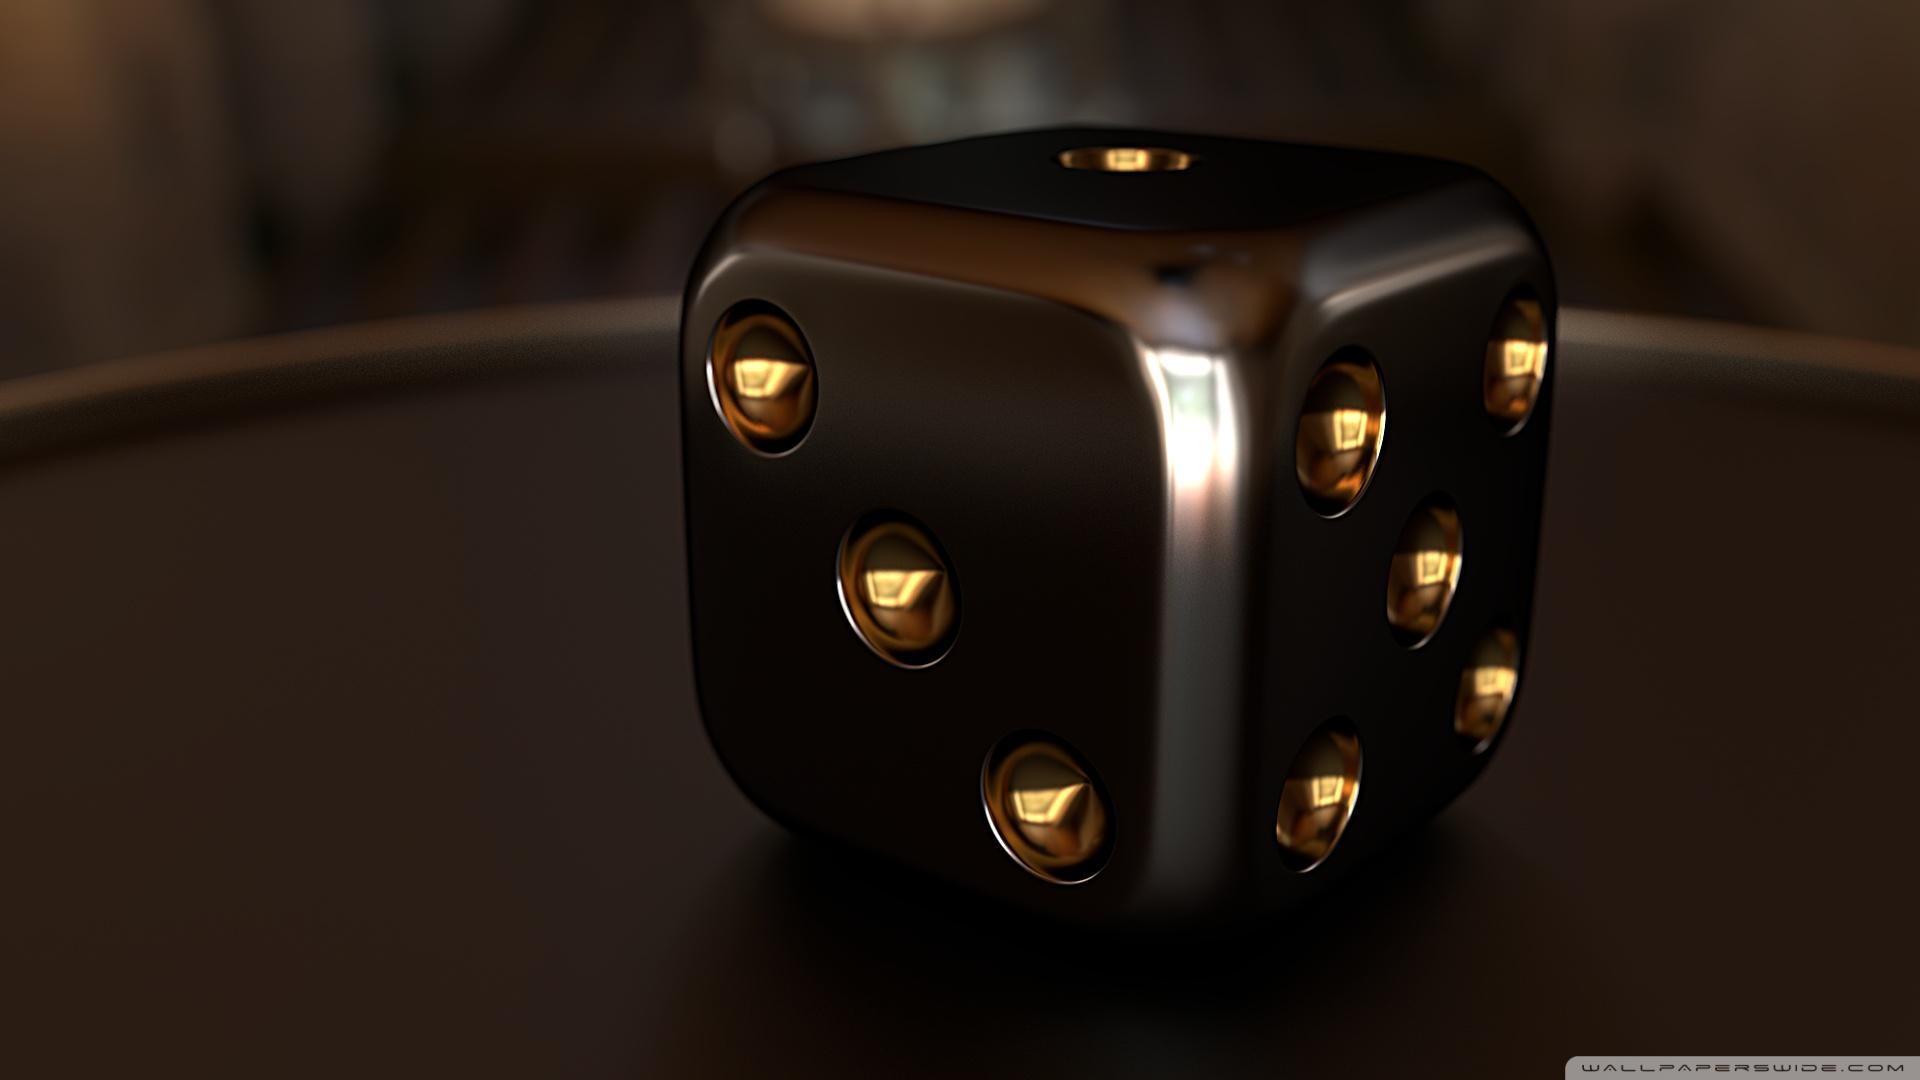 3d dice 10 ❤ uhd desktop wallpaper for ultra hd 4k 8k